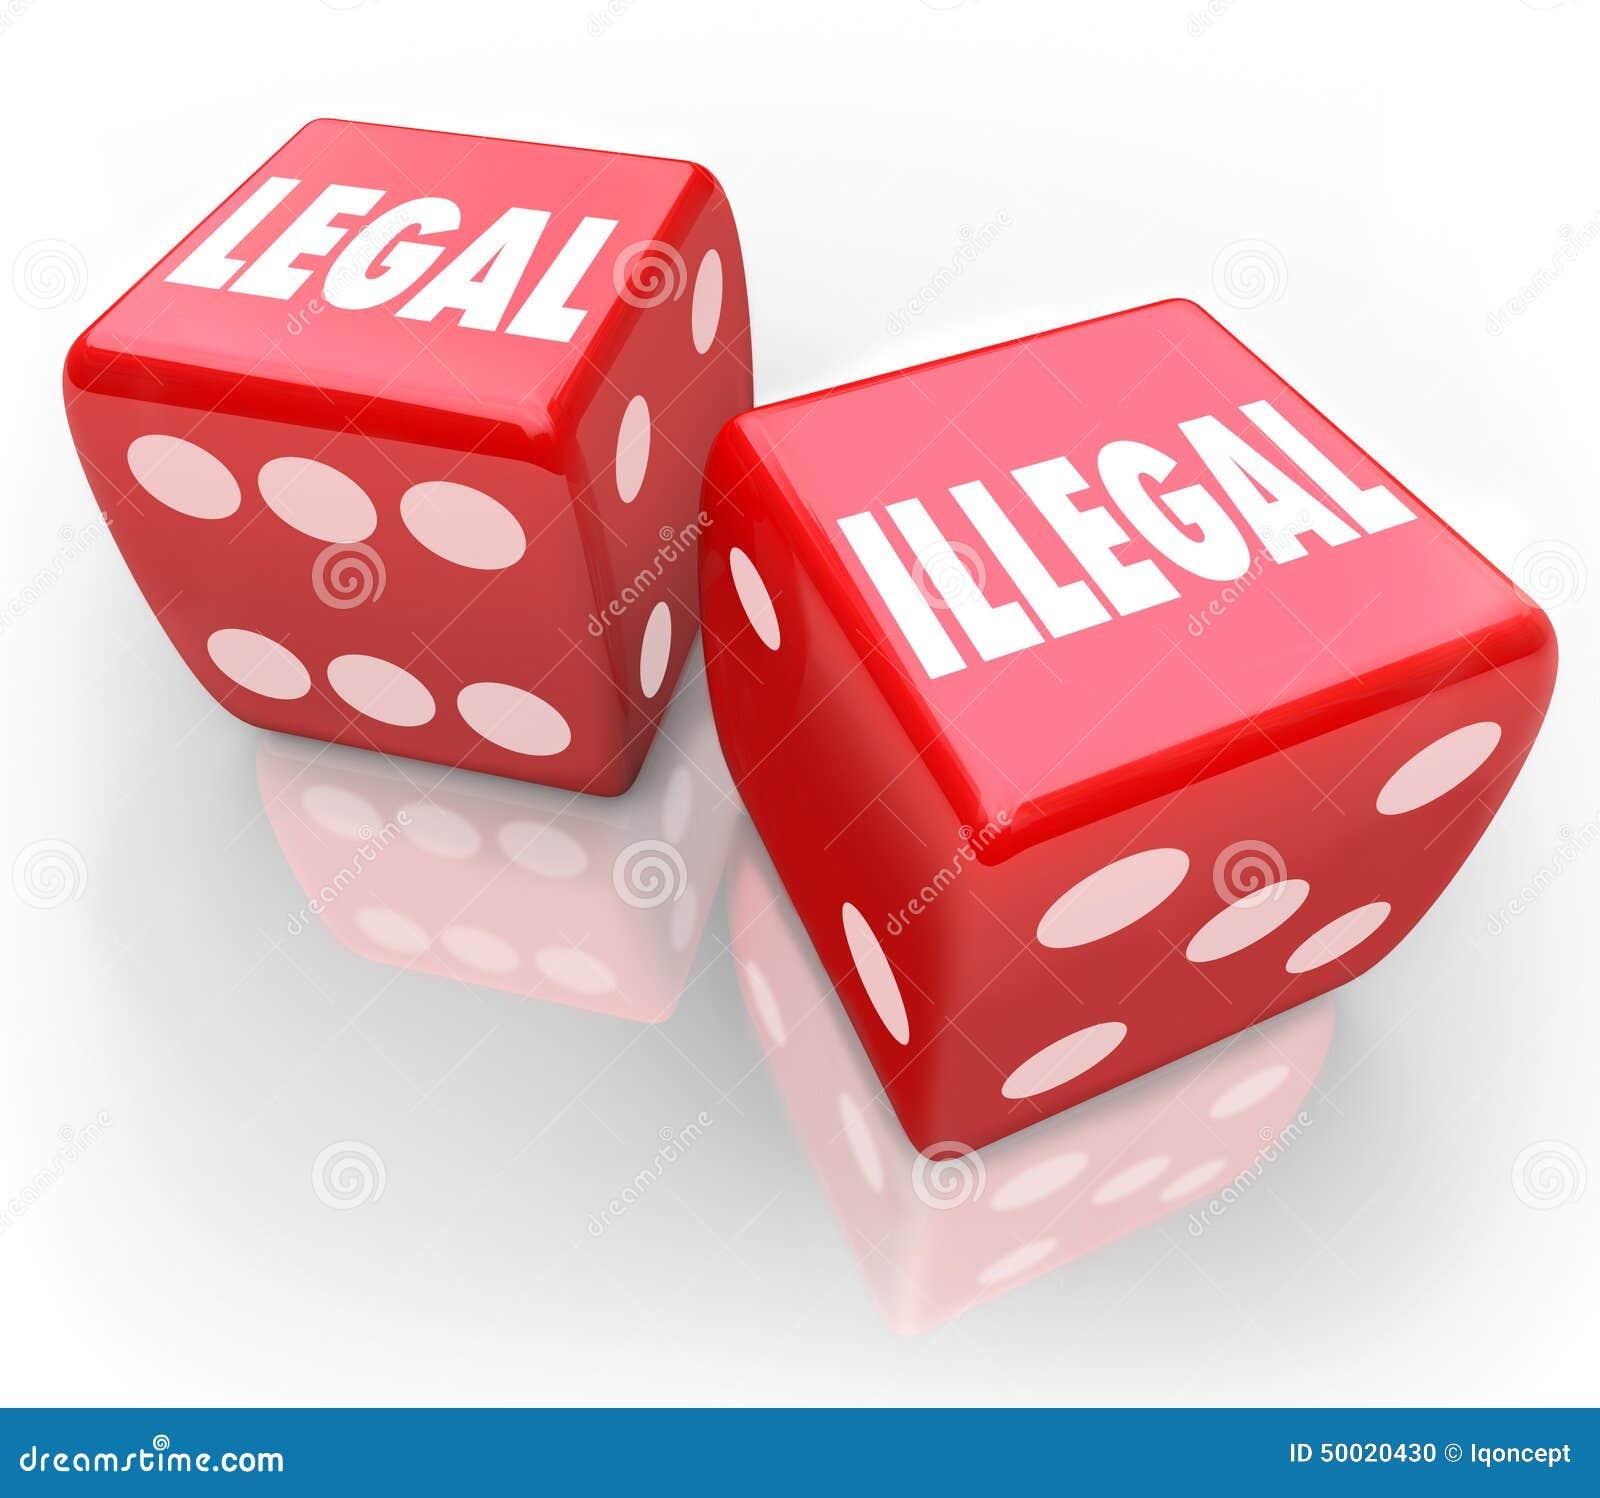 prosti prostitución legal o ilegal